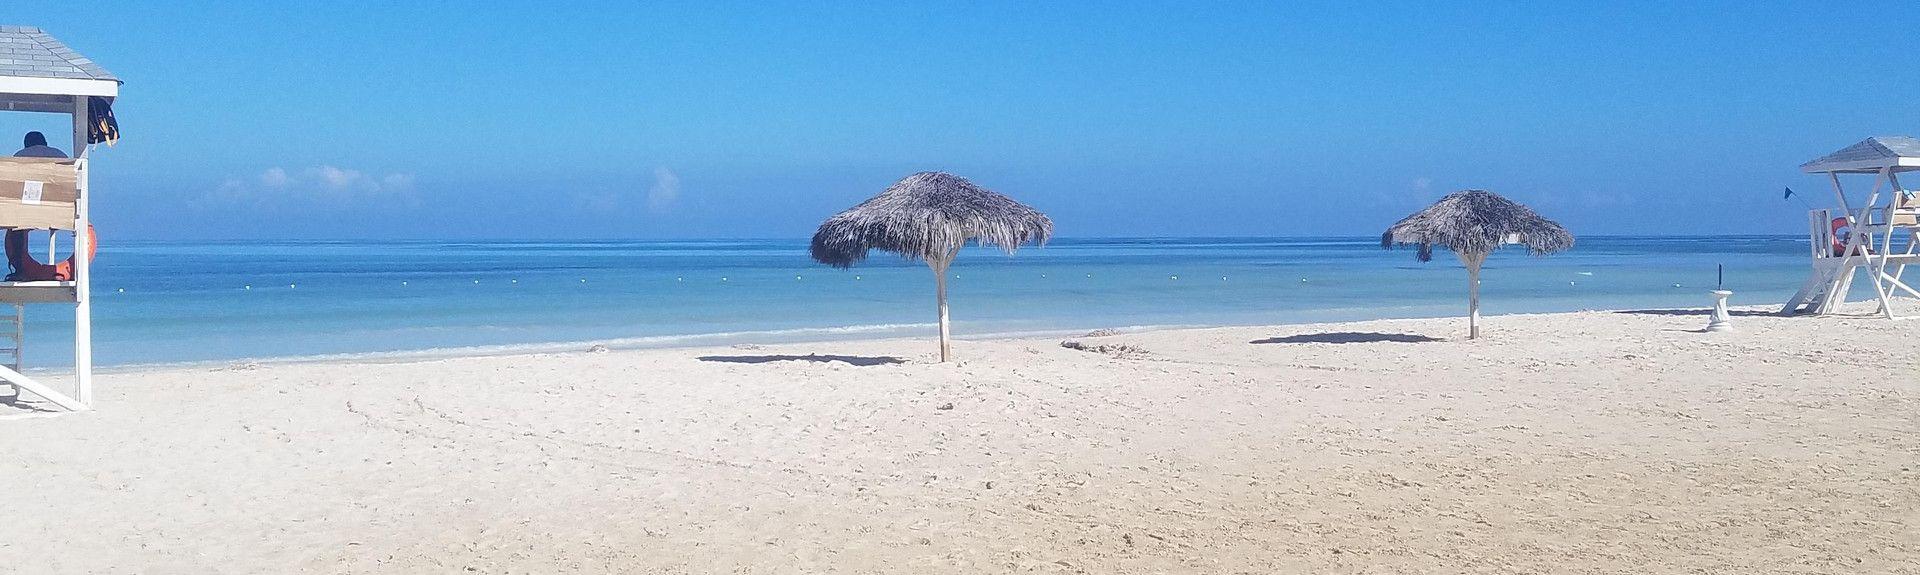 Doctor's Cave Beach, Montego Bay, Saint James, Jamaica